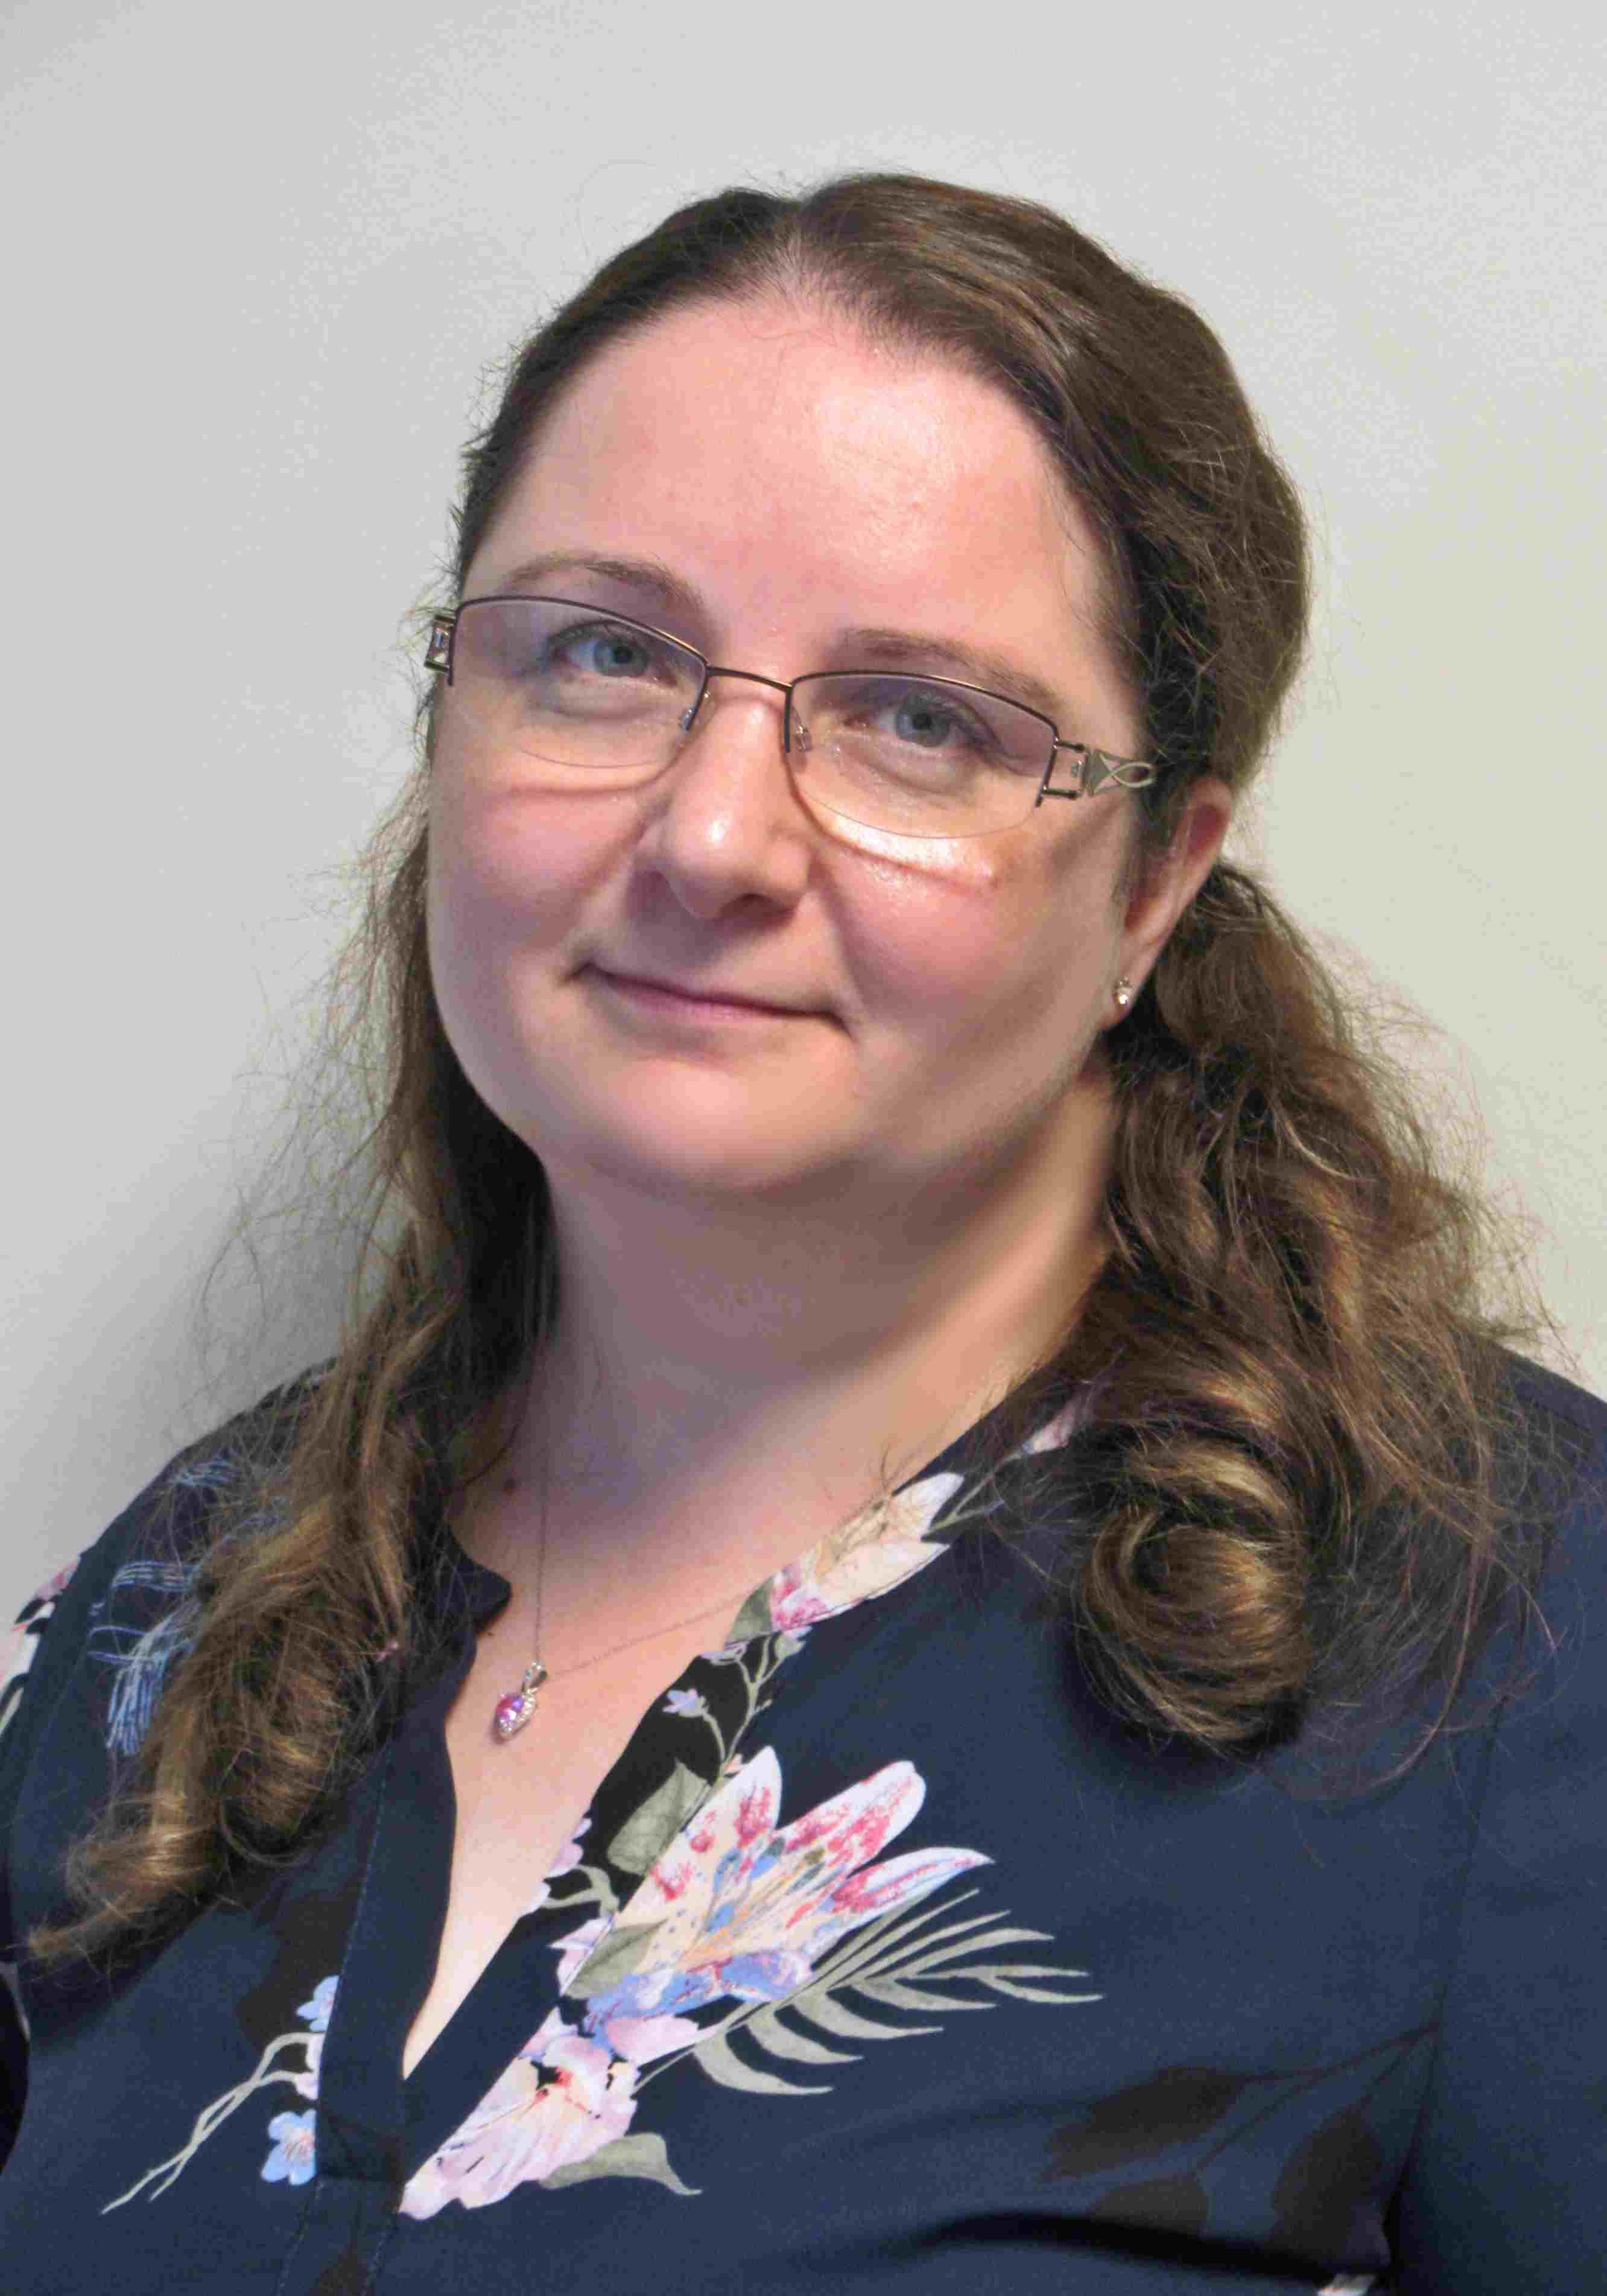 Rosa Saverino, Sessional Lecturer